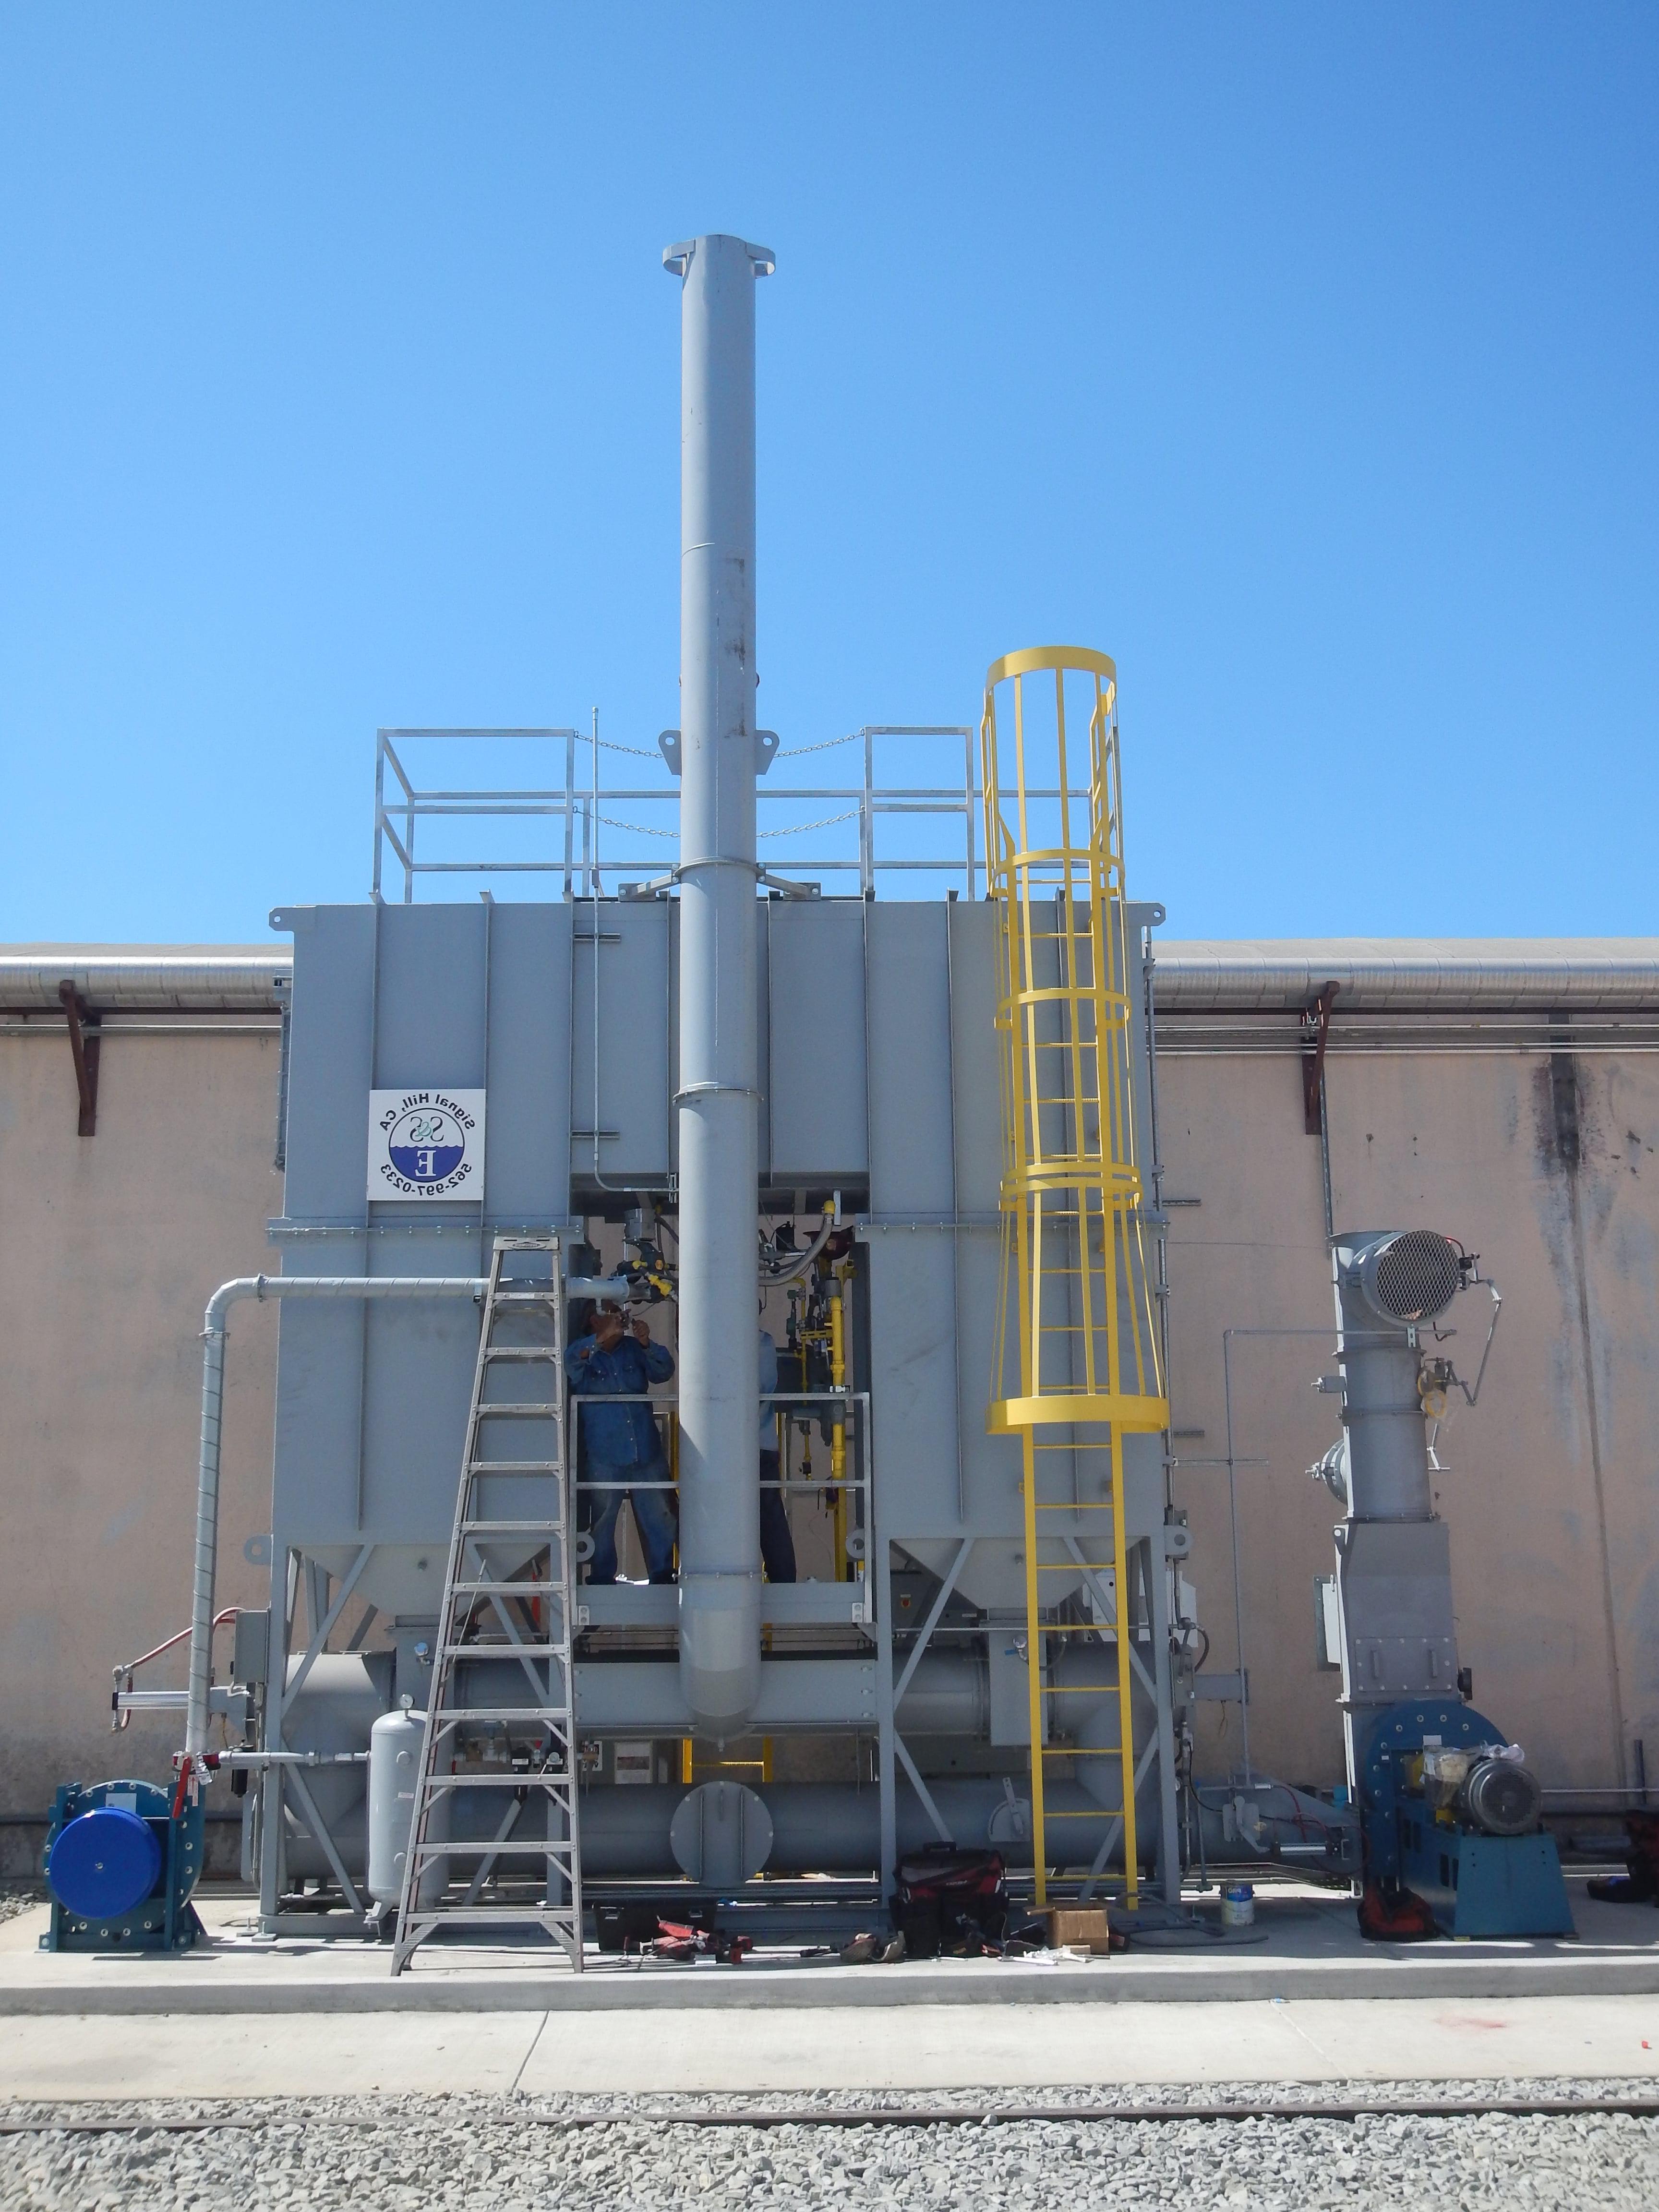 4000 SCFM再生热氧化剂的工厂